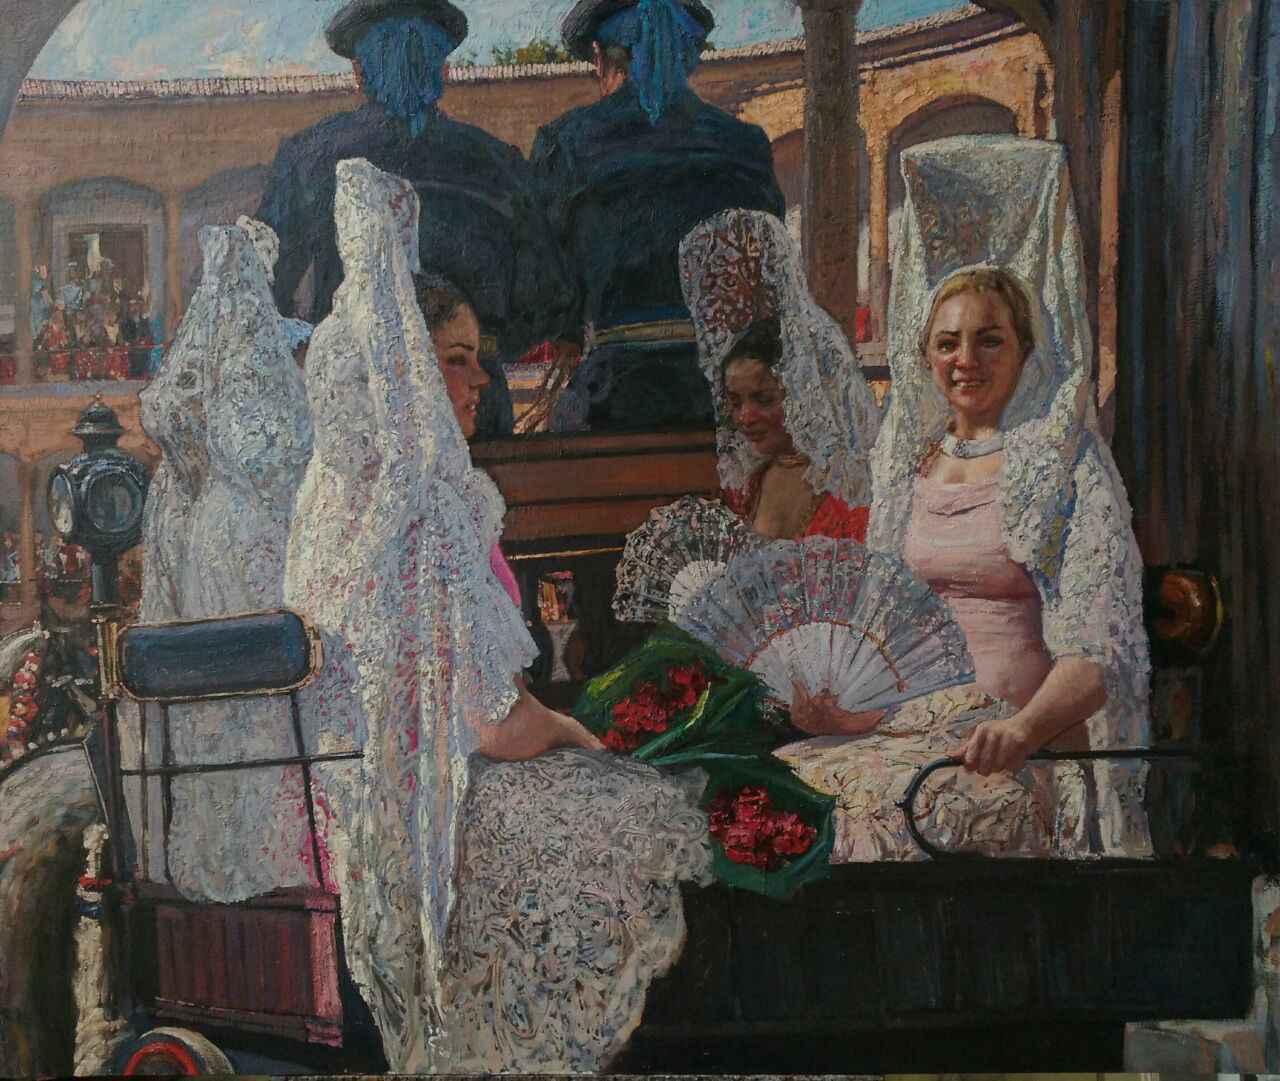 Goyescas (Russia) by  Daud Akhriev - Masterpiece Online